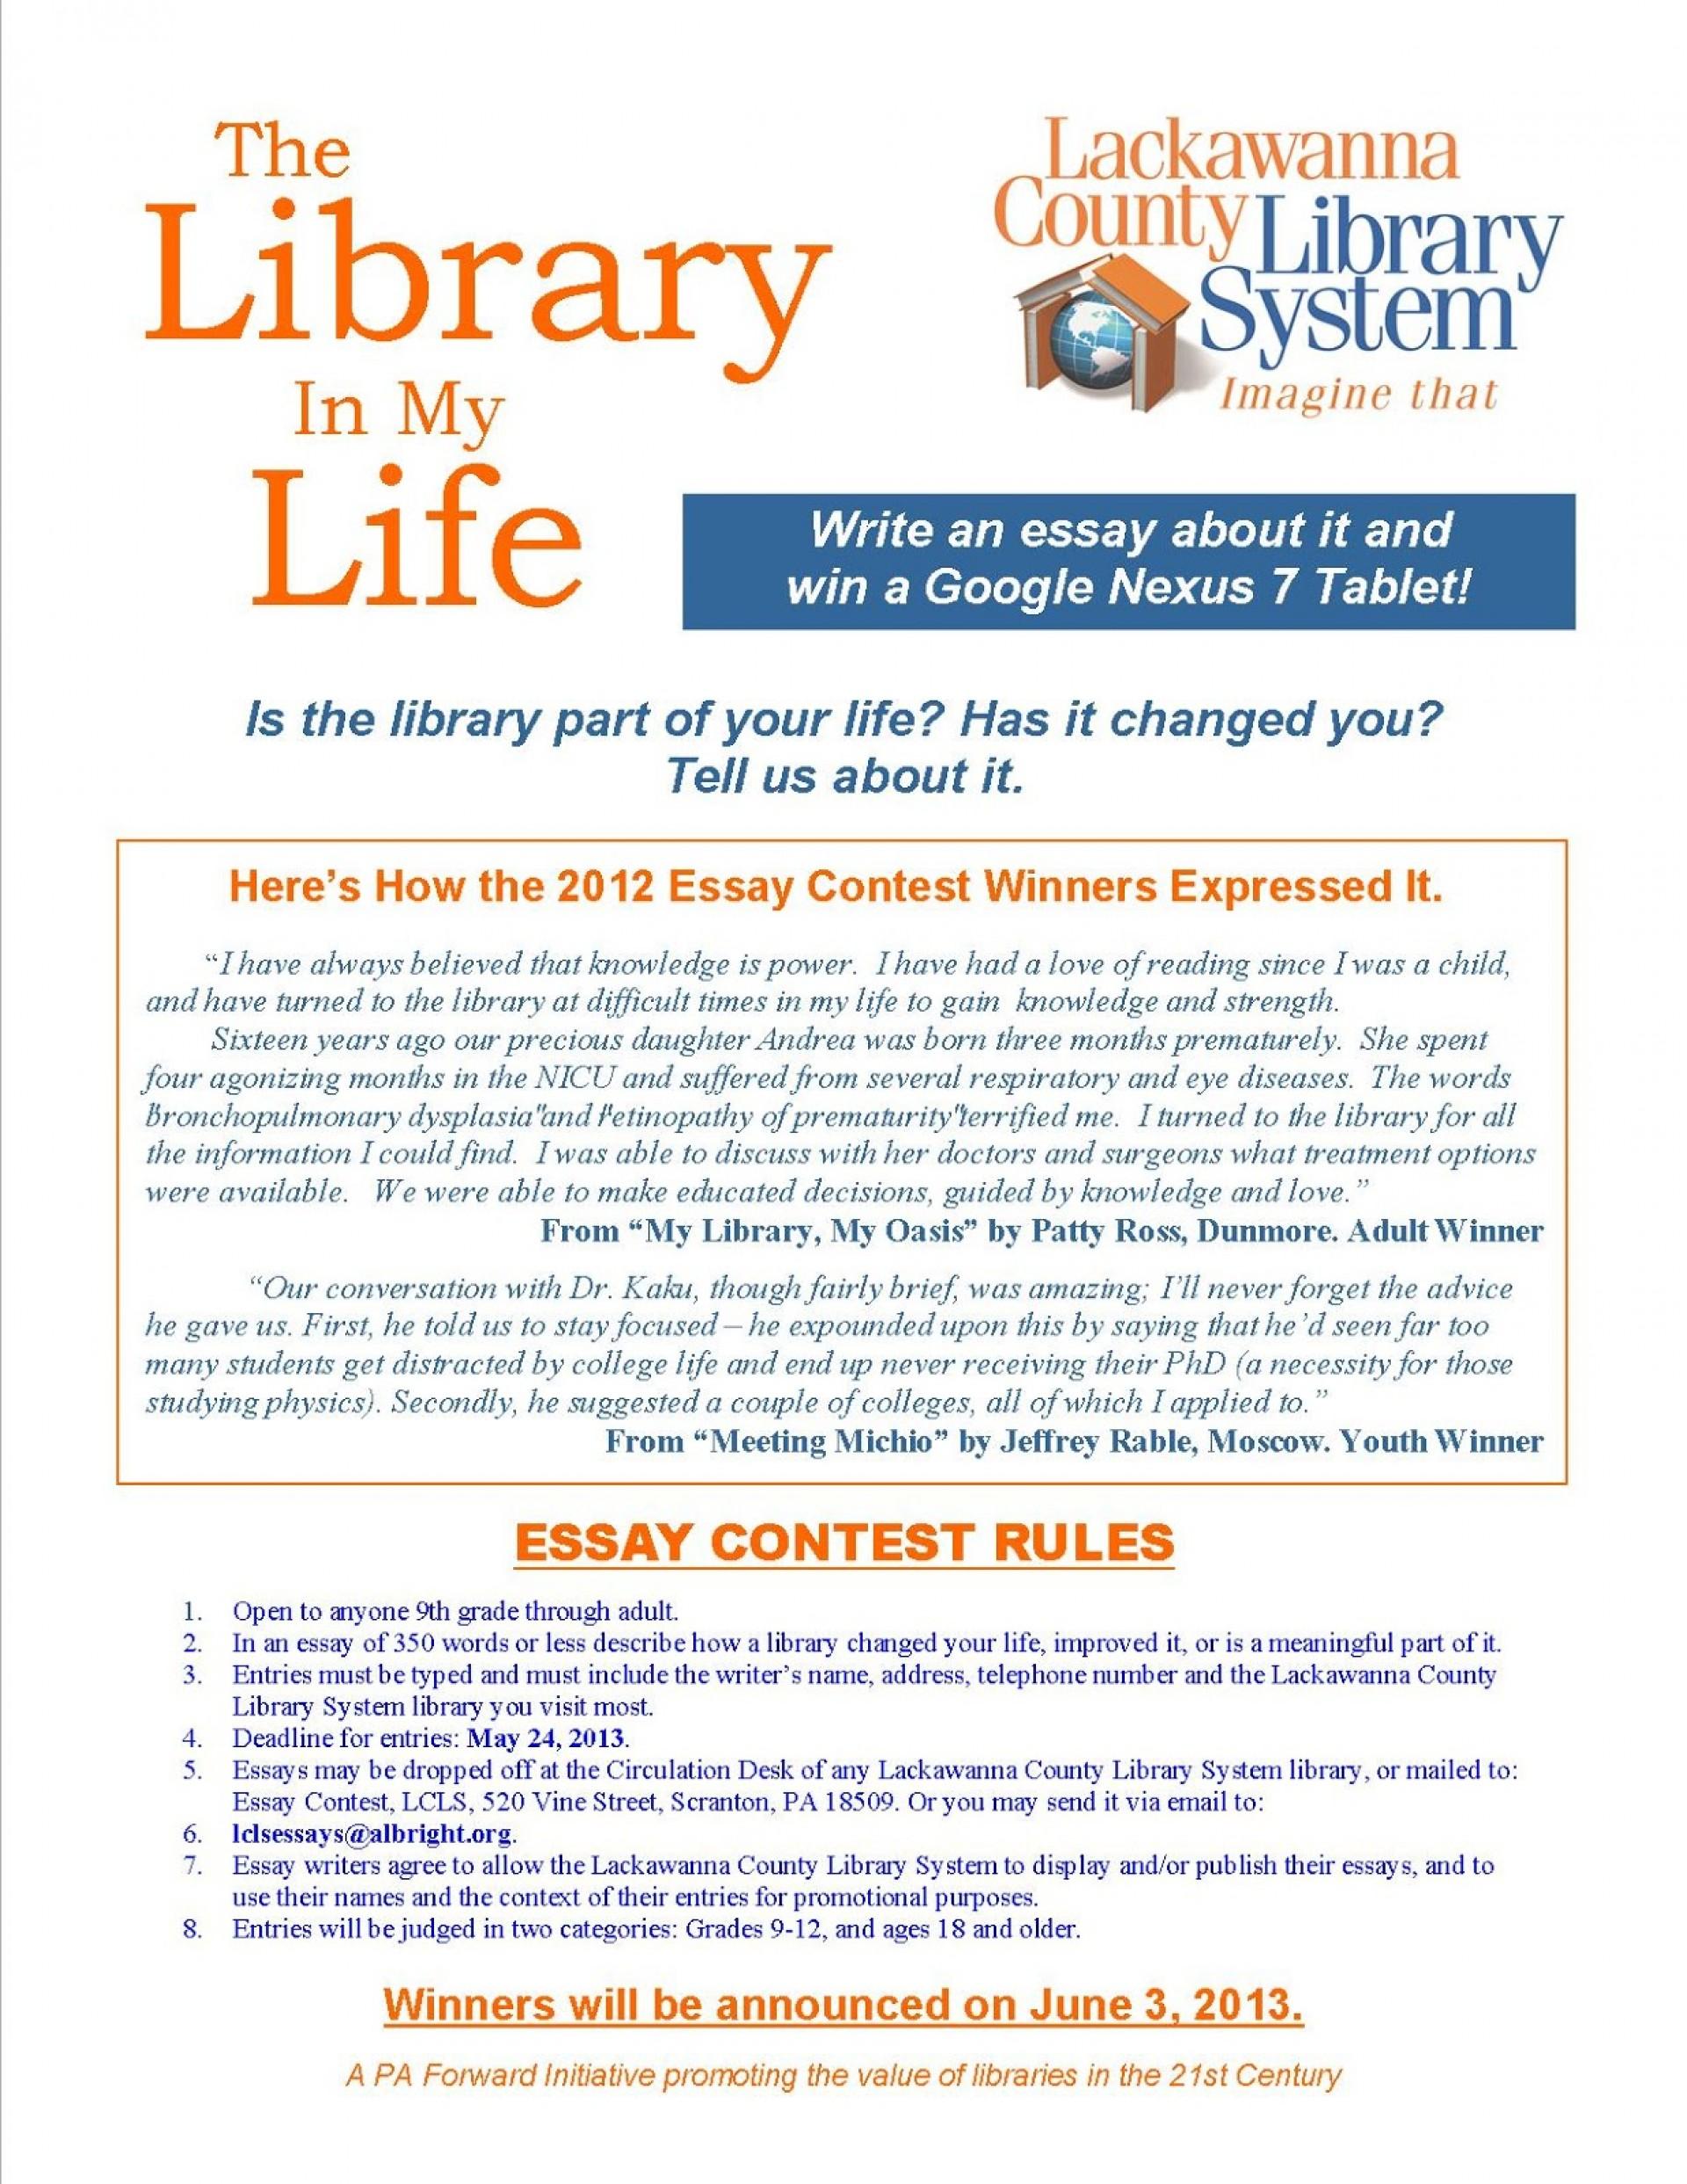 021 Essay Writing Companies Uk 201320essay20contest20flyer20final Top Websites Sites 1920